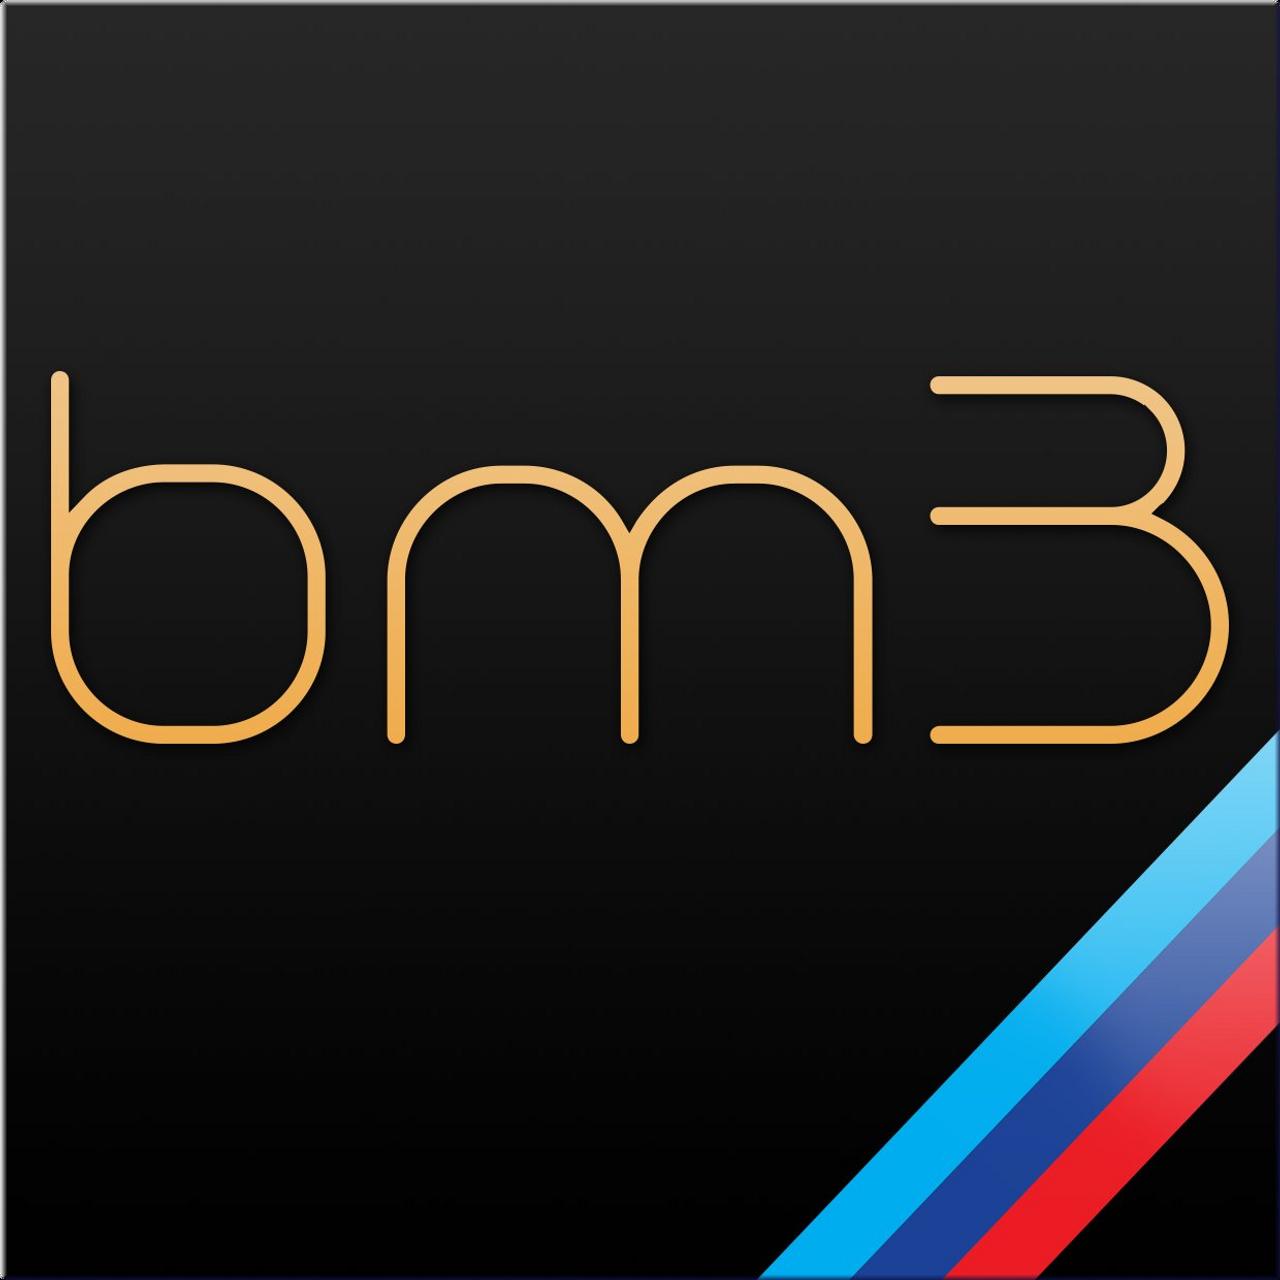 BootMod3 BM3 Flash Tune N55 BMW F20 / F22 / F30 / F32 M235I 335I 435I